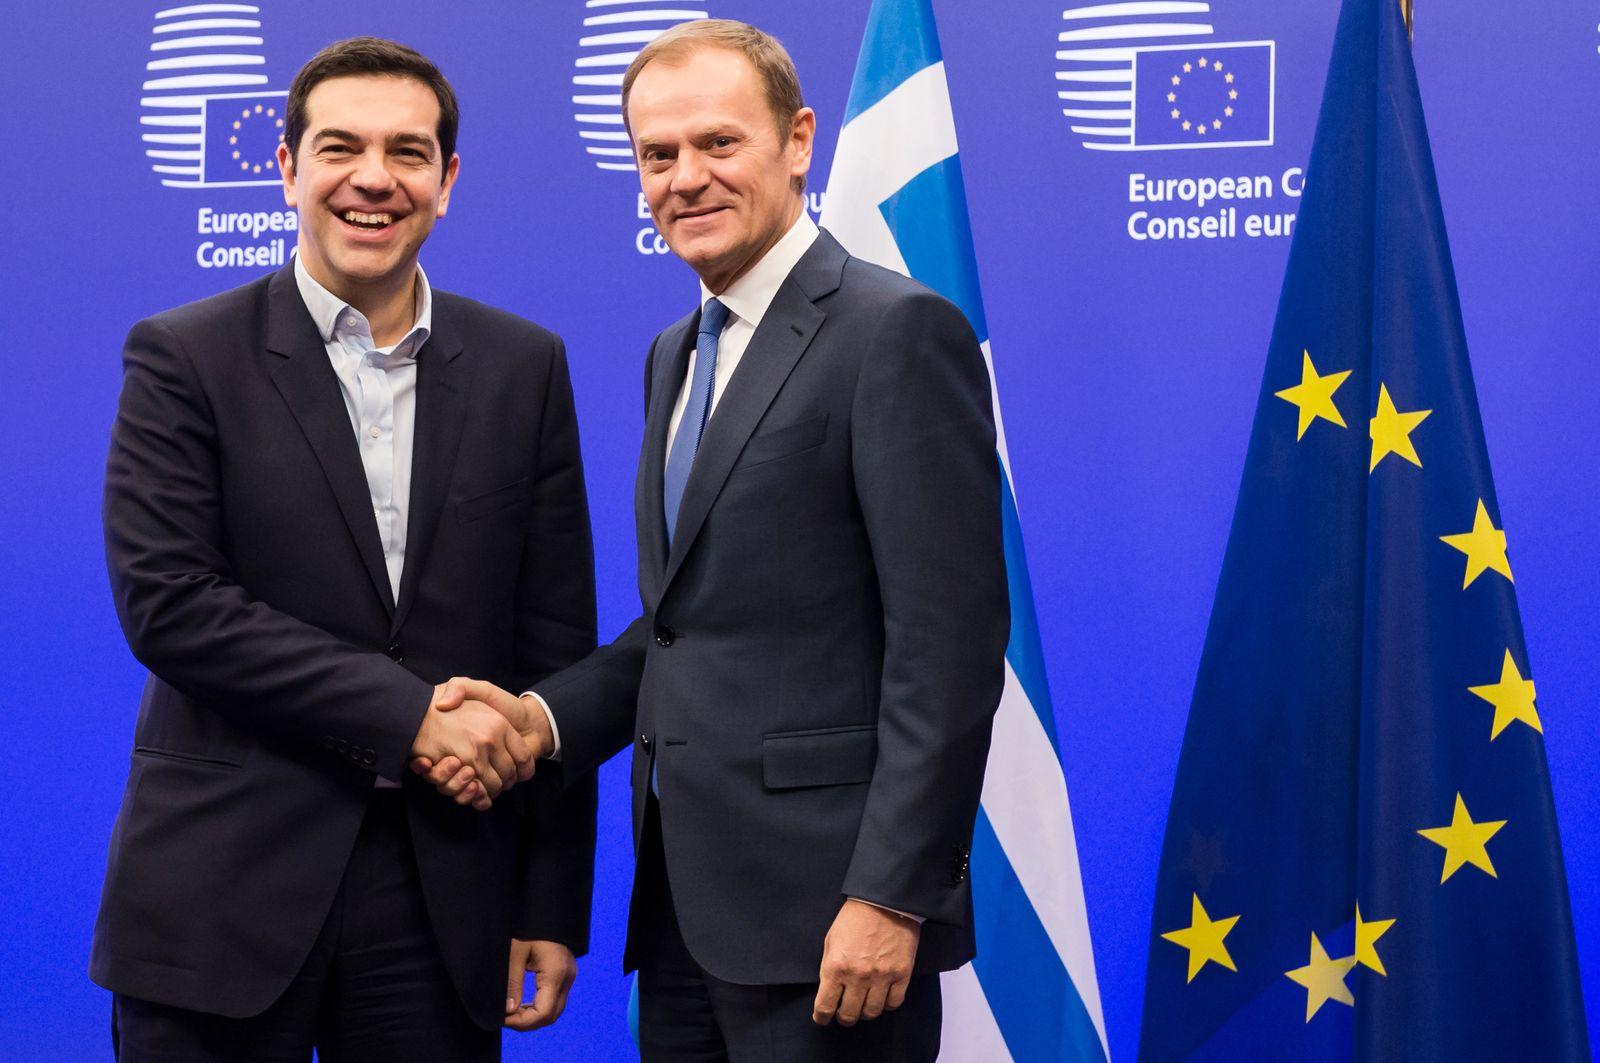 Tusk / Tsipras / griechische Road Show